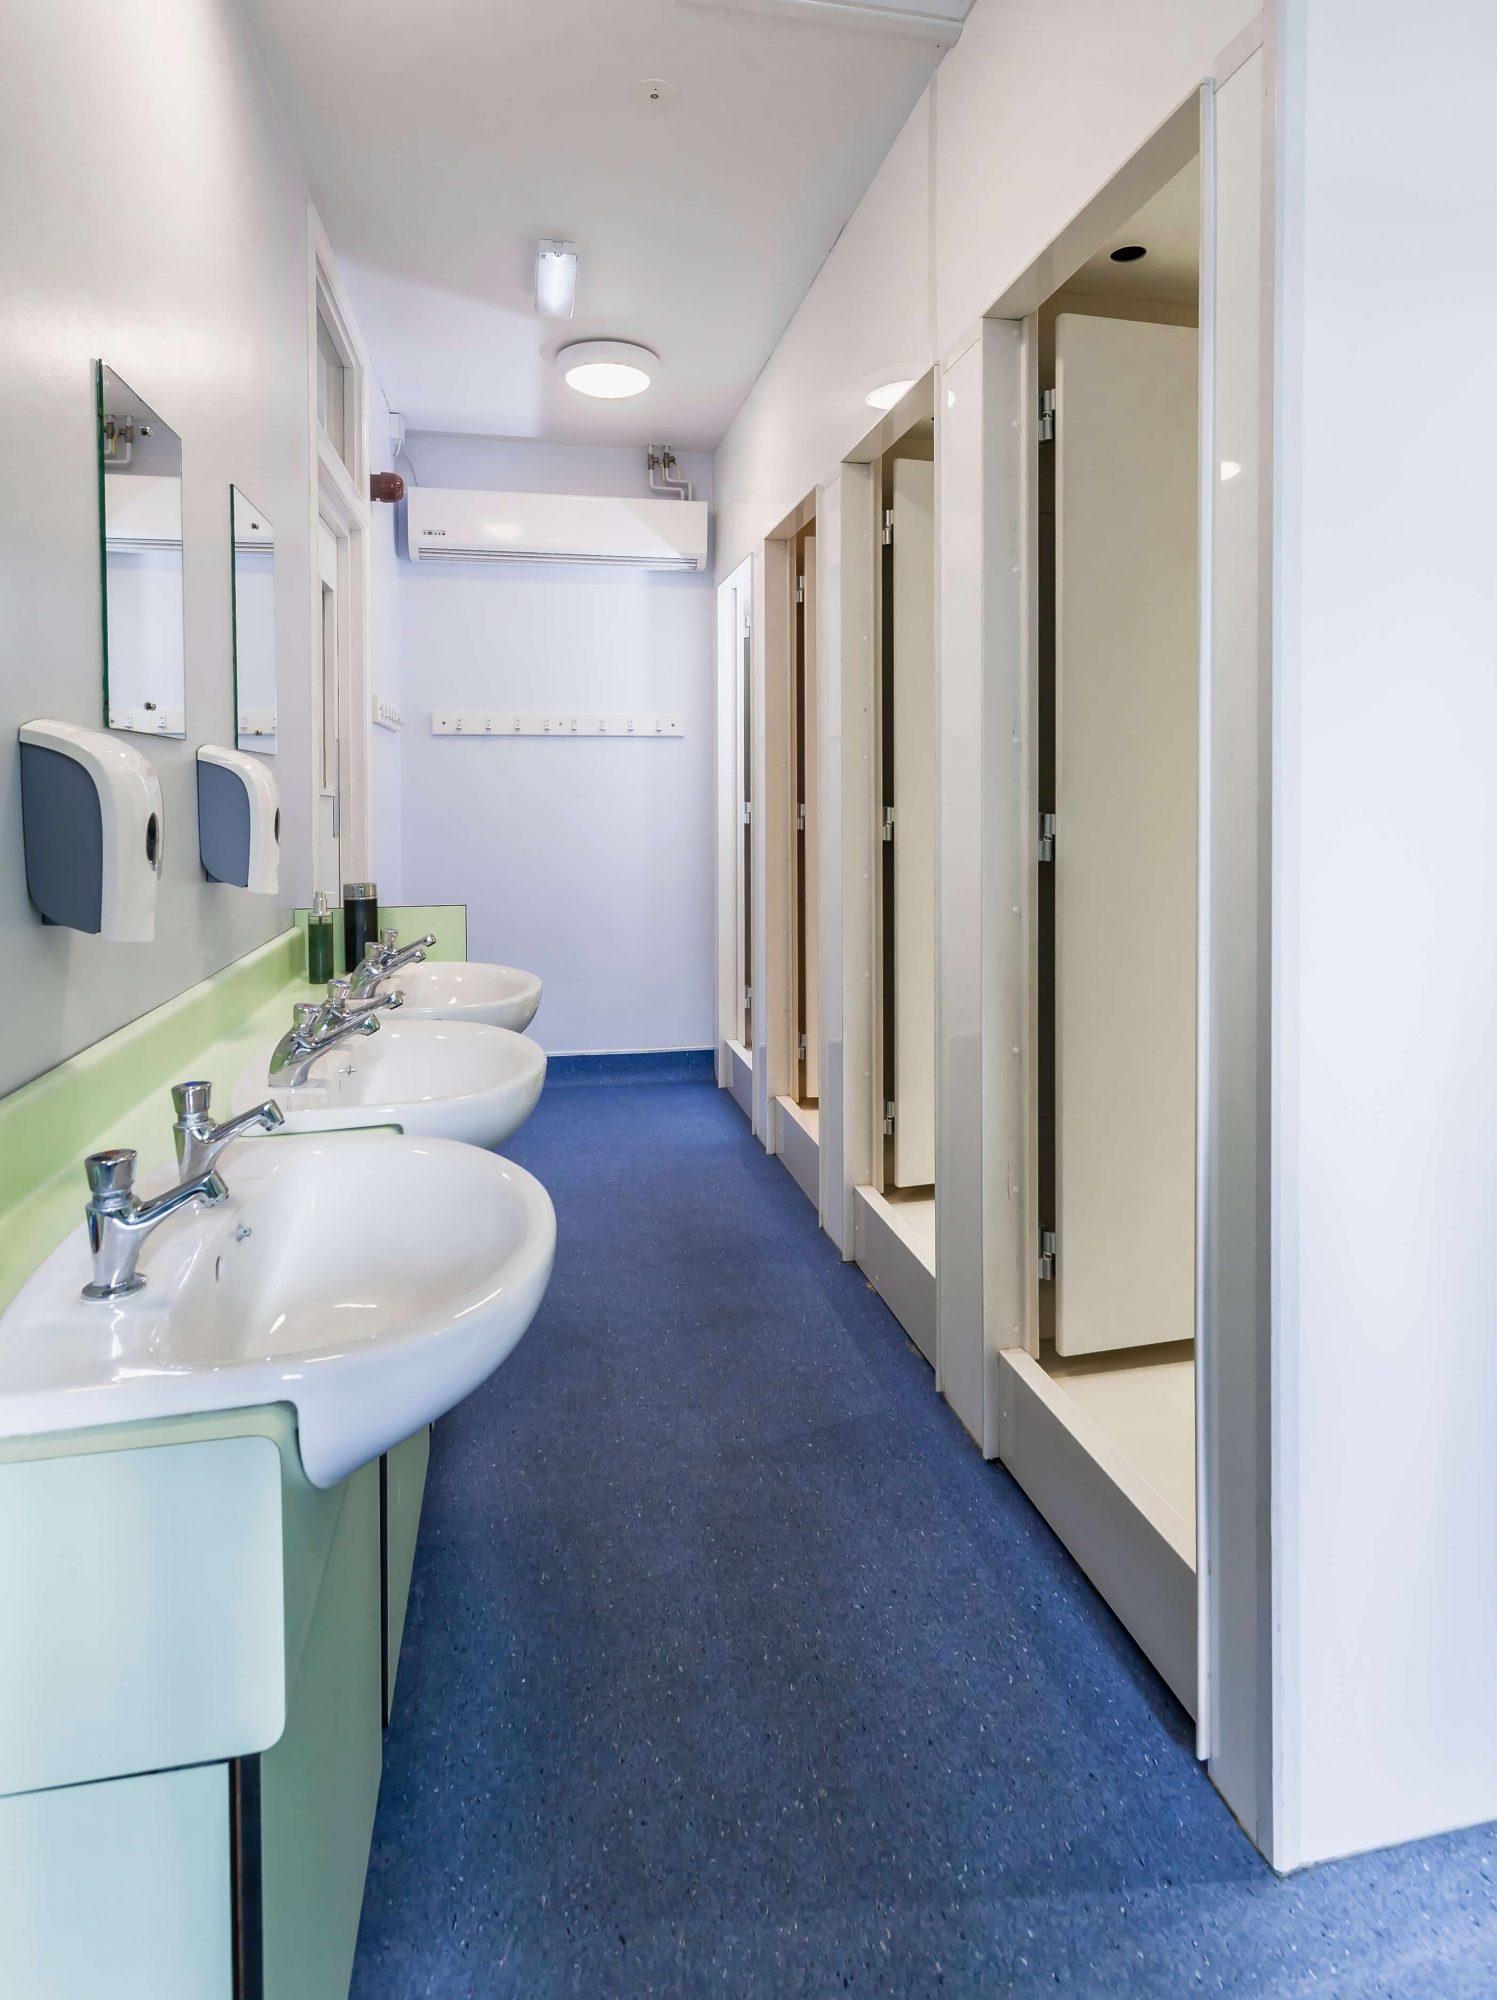 Lancing College_washroom showers